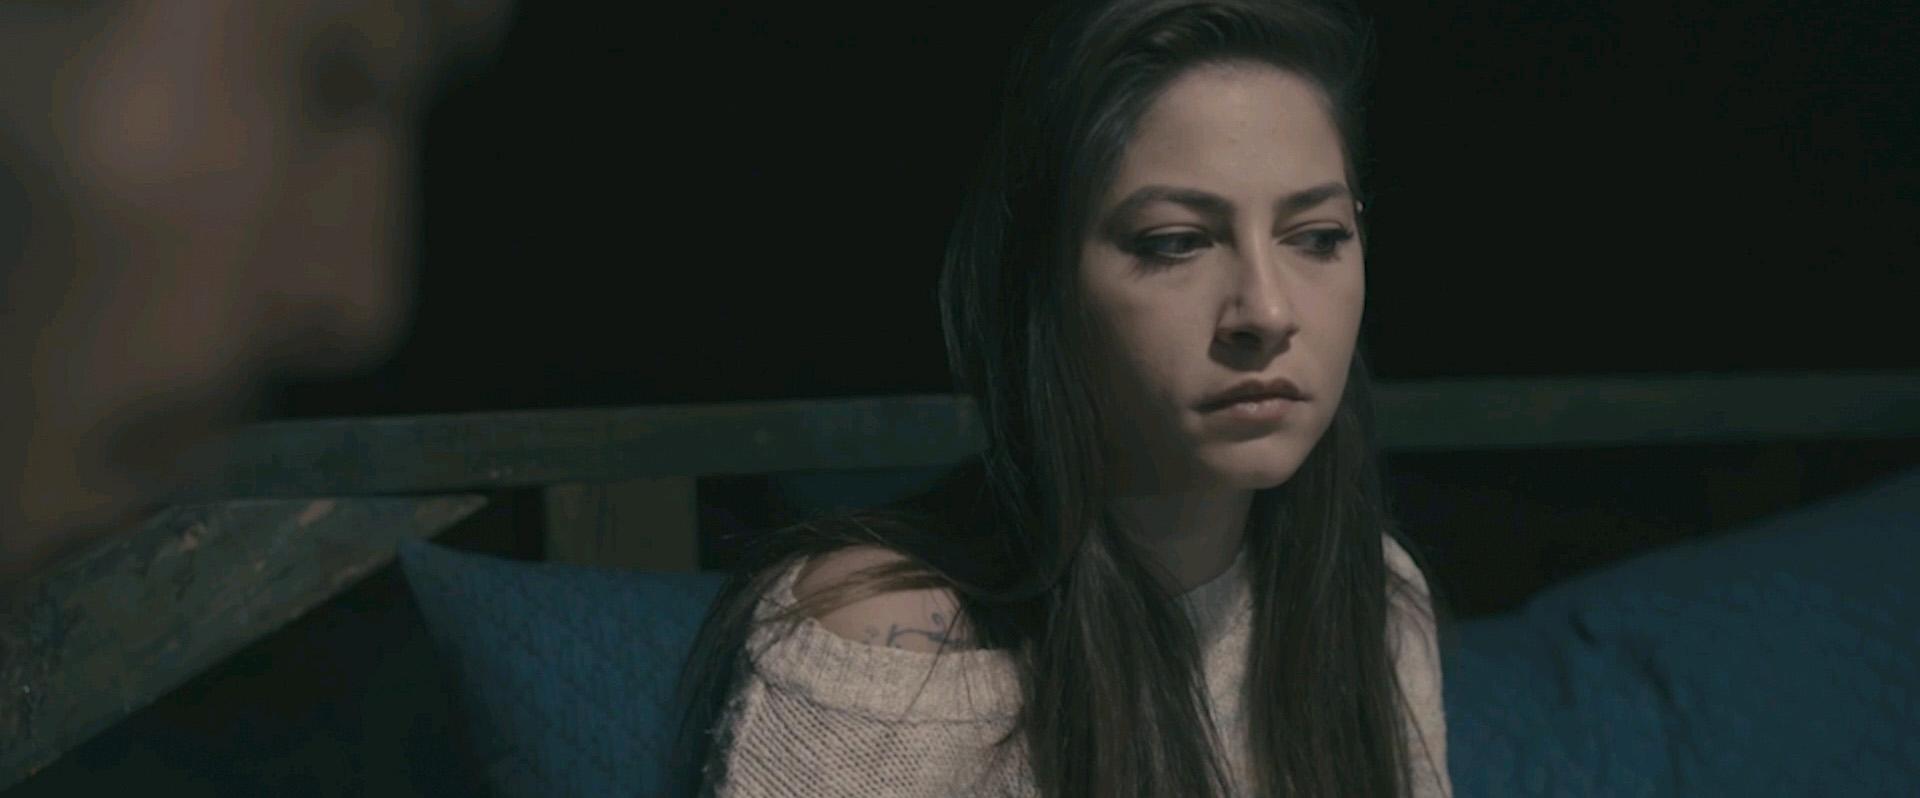 Karantina XII: İblis'in Oyunu   2018   Yerli Film   WEB-DL   XviD   Sansürsüz   1080p - m720p - m1080p   WEB-DL   Tek Link